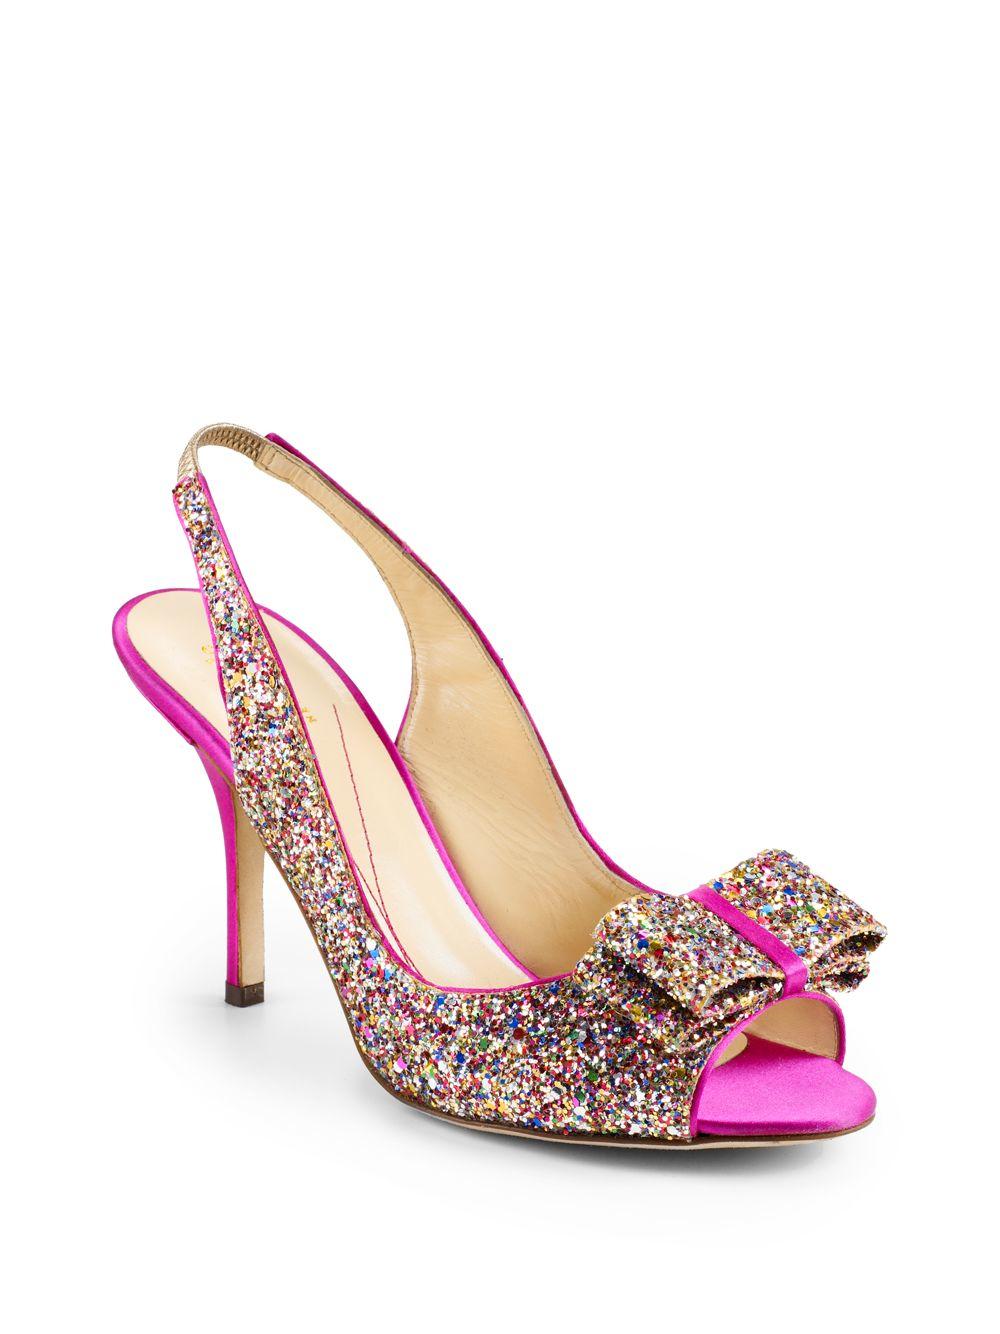 47ab731f4cb Lyst - Kate Spade Charm Glitter Bow Slingback Pumps